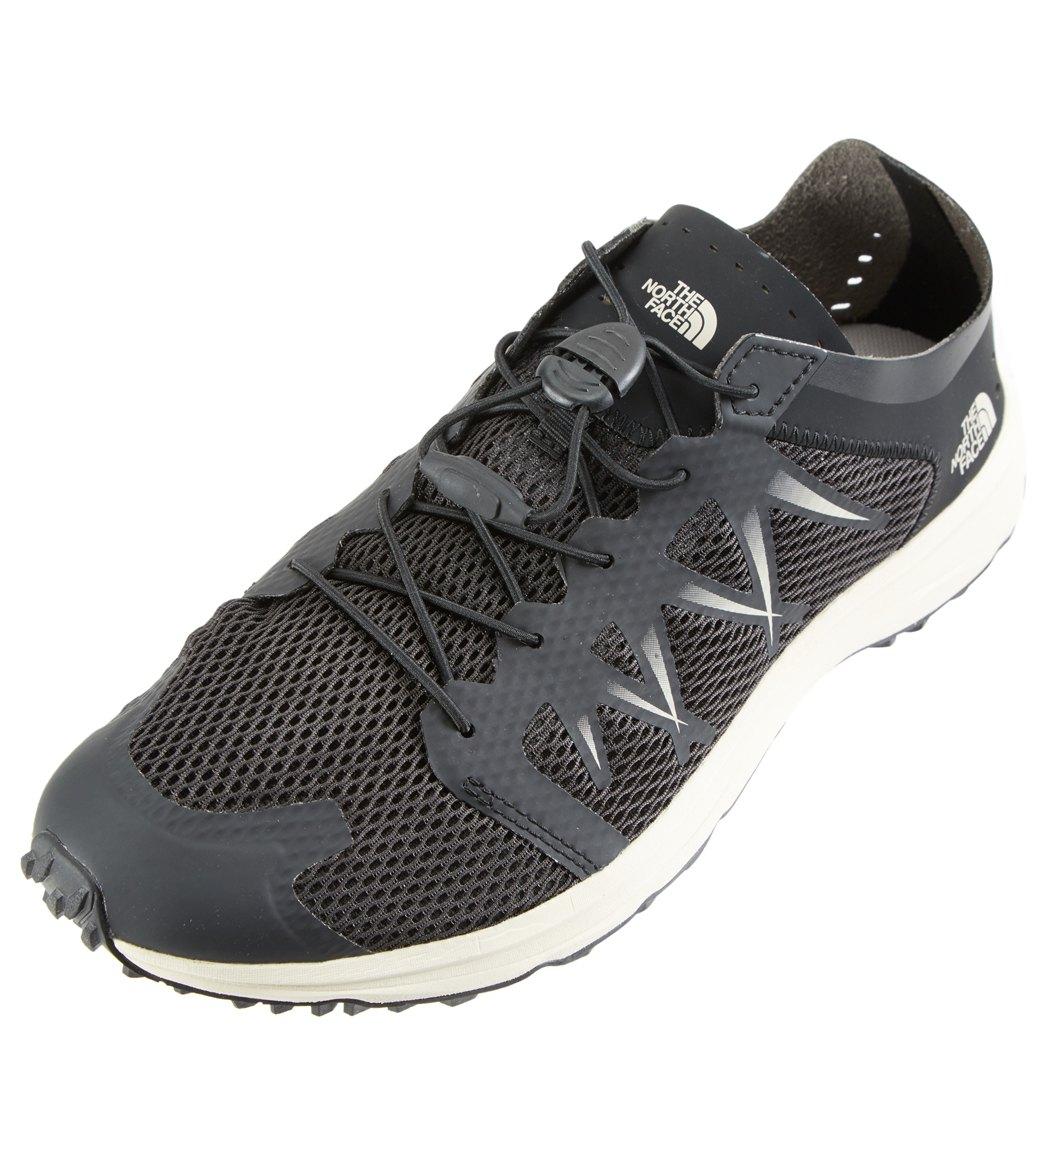 7c38f7caa The North Face Men's Litewave Flow Lace Water Shoe